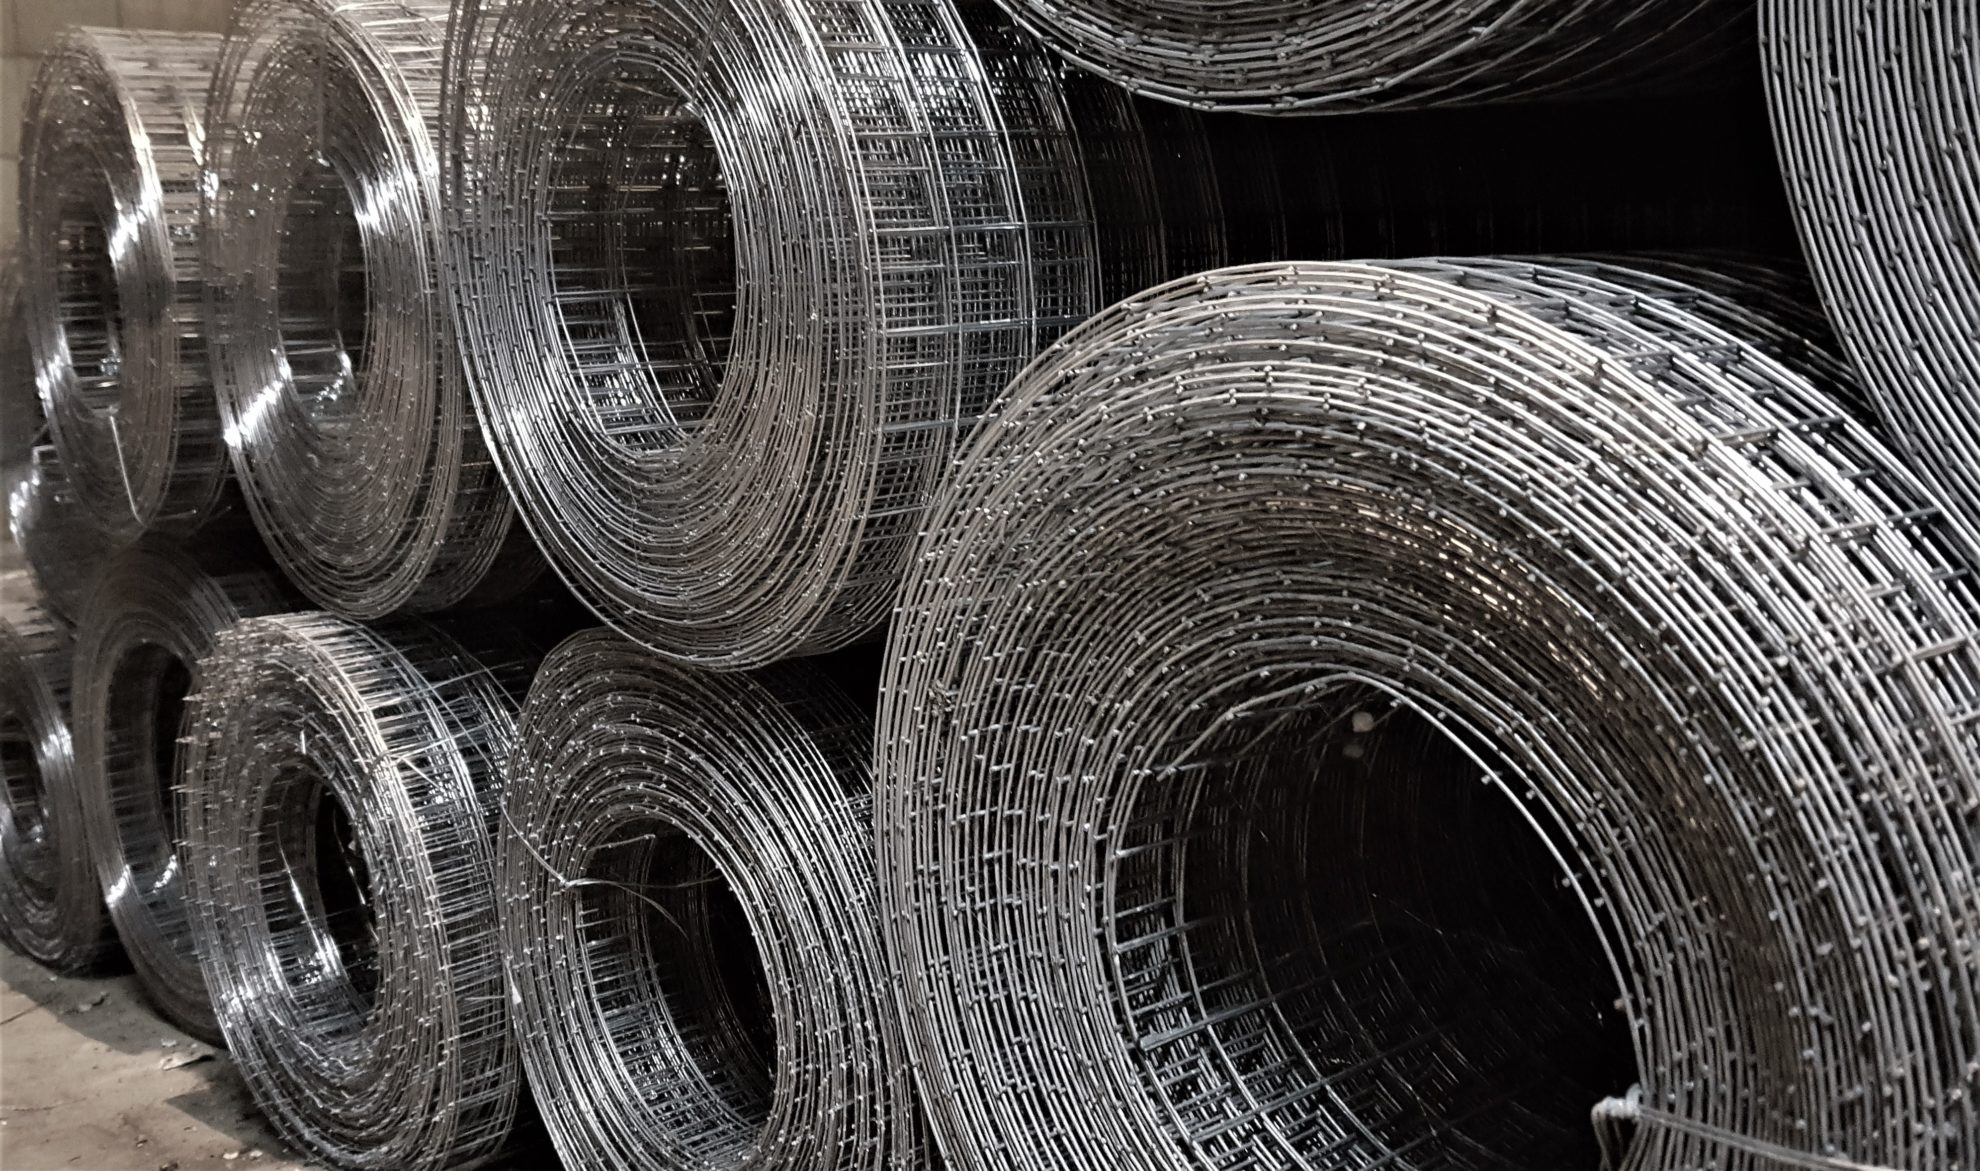 штукатурная сетка в рулонах на складе